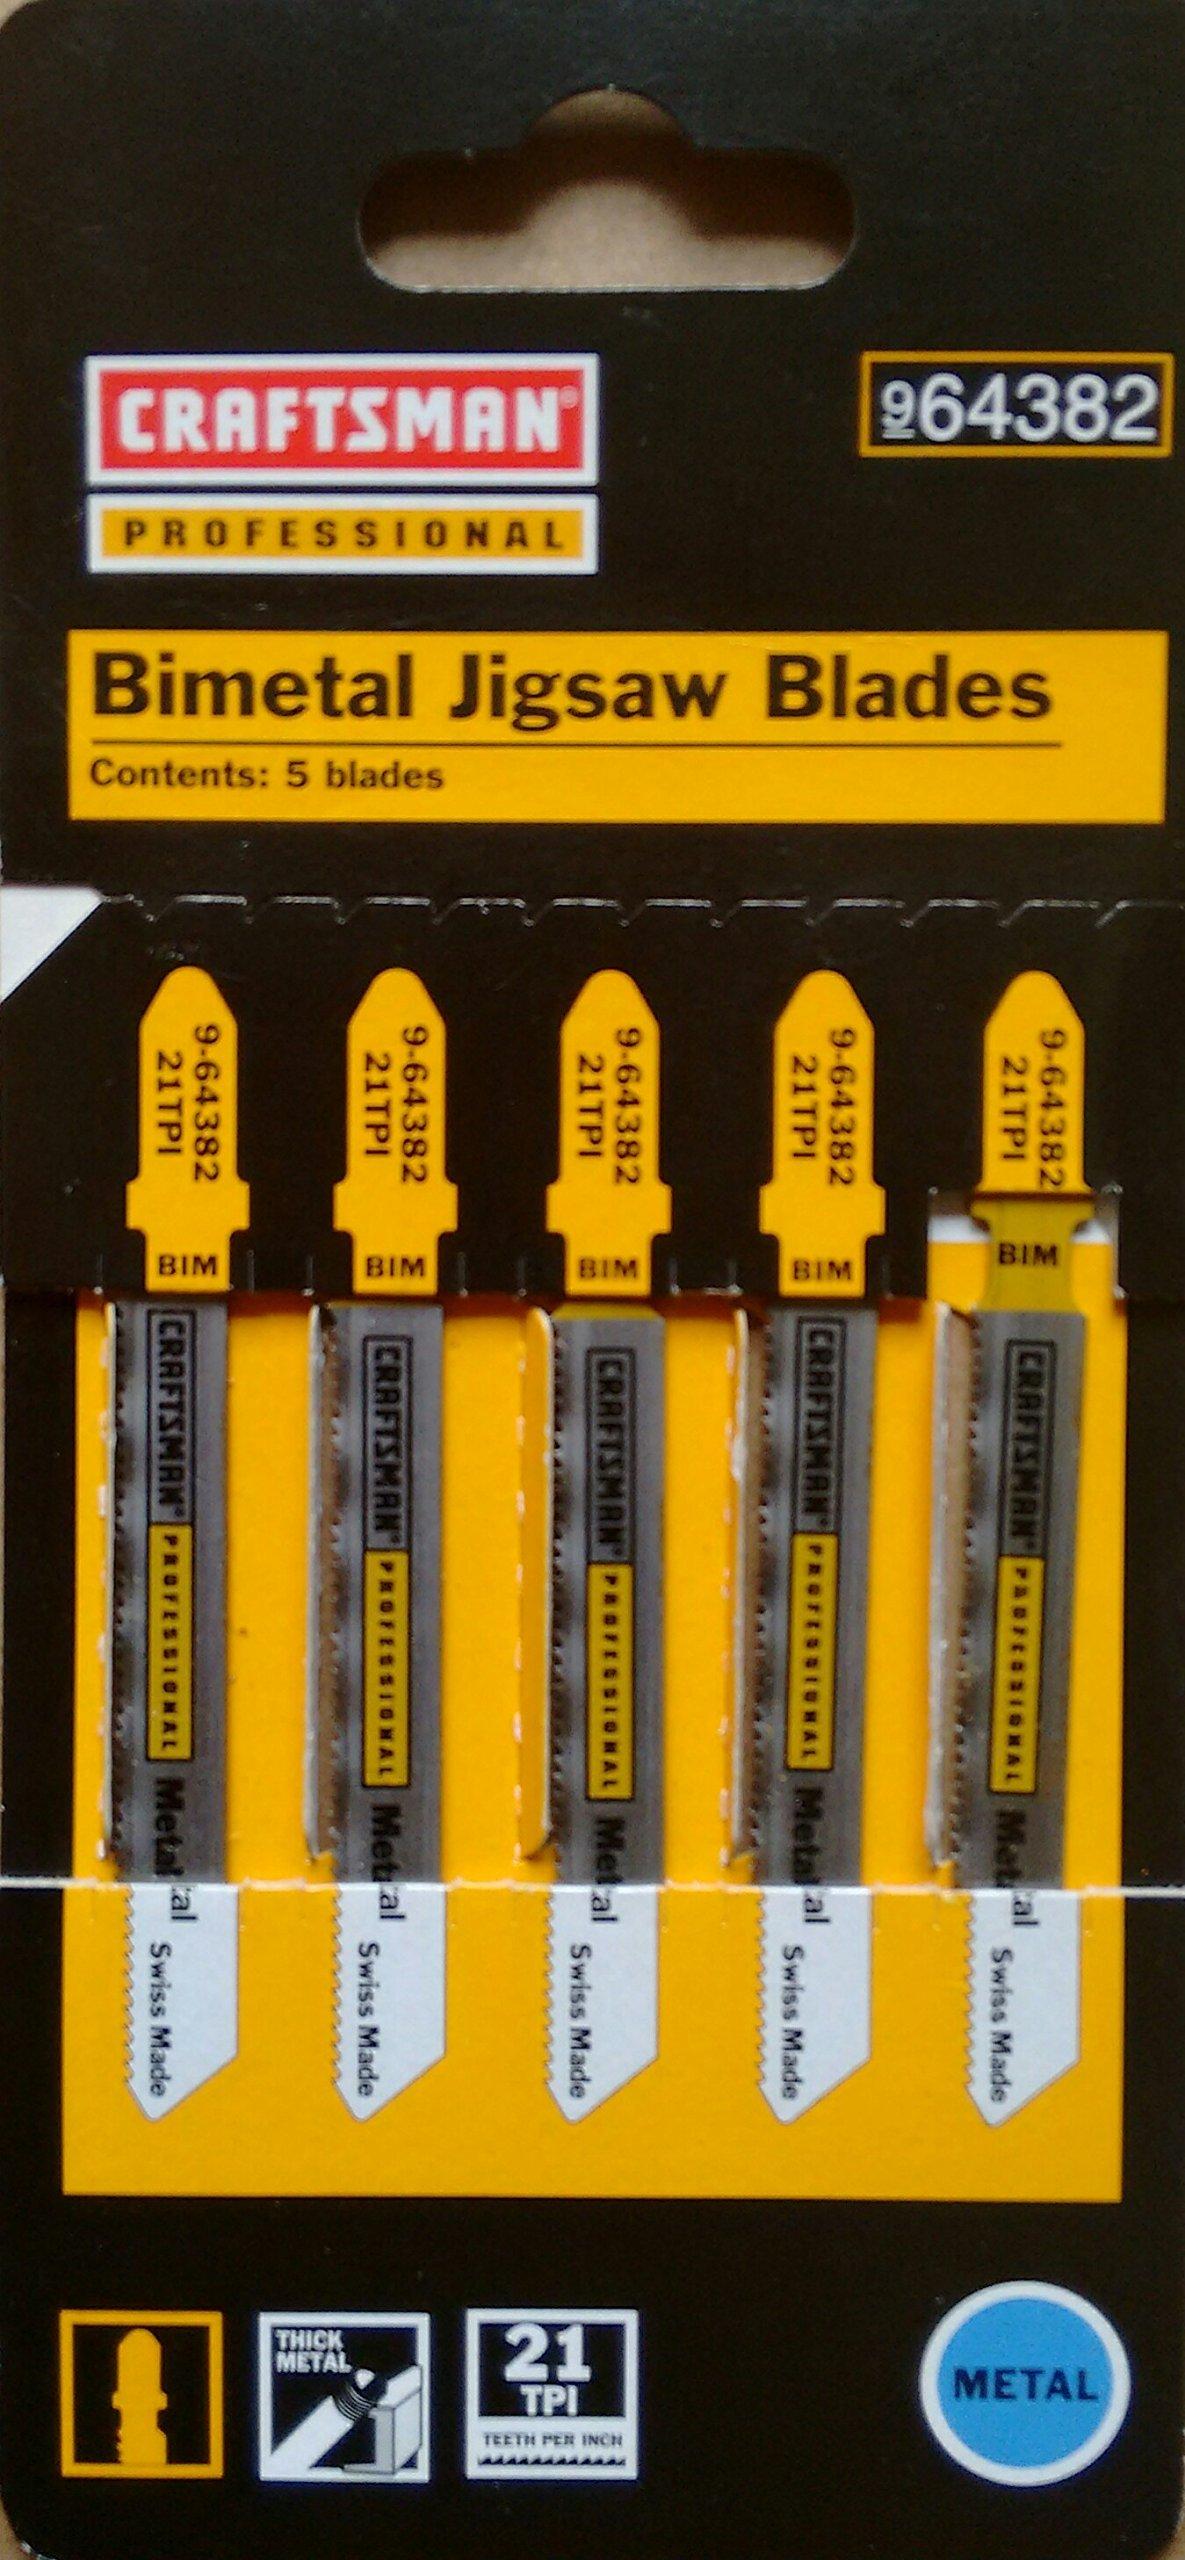 Craftsman Professional Bimetal Jigsaw Blades 5 pack, Made in Switzerland, 9-64382